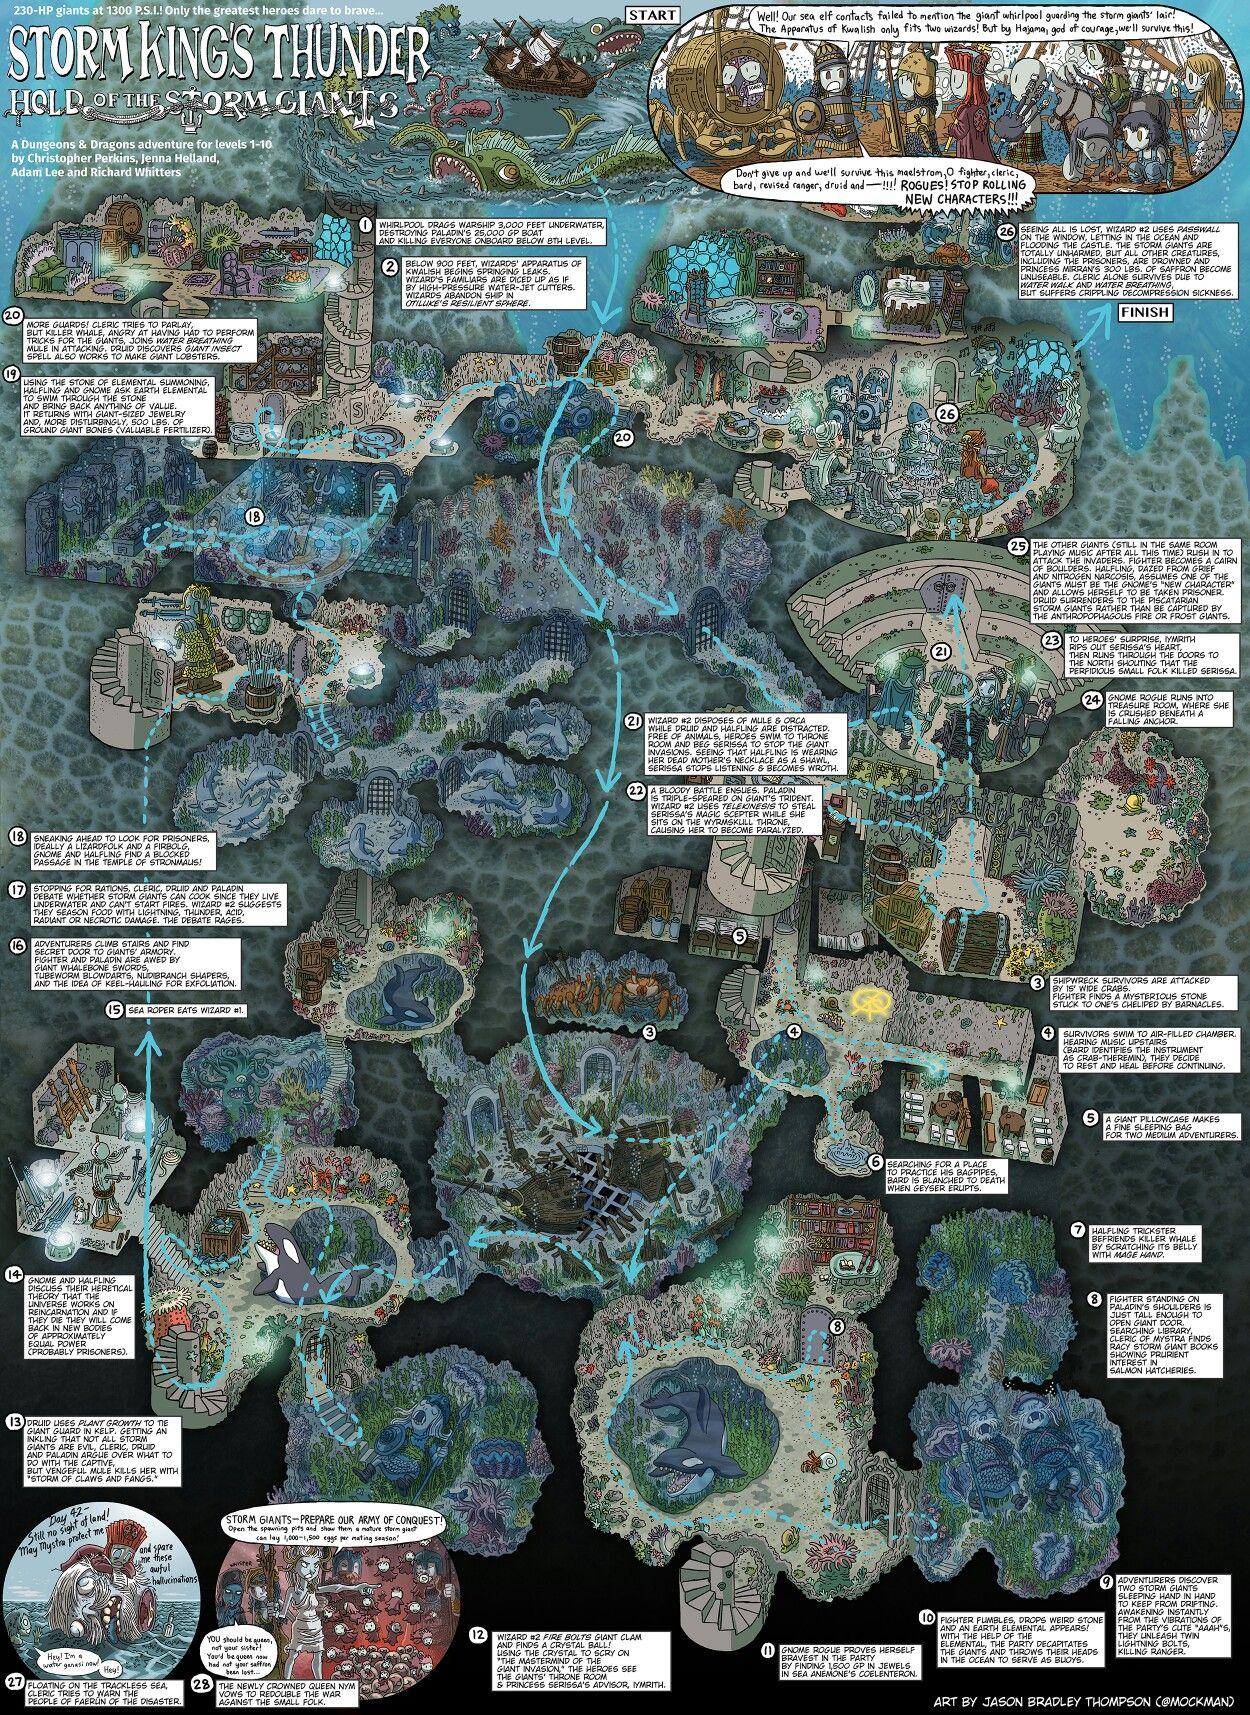 Classic Du0026D Walkthrough Maps RPG